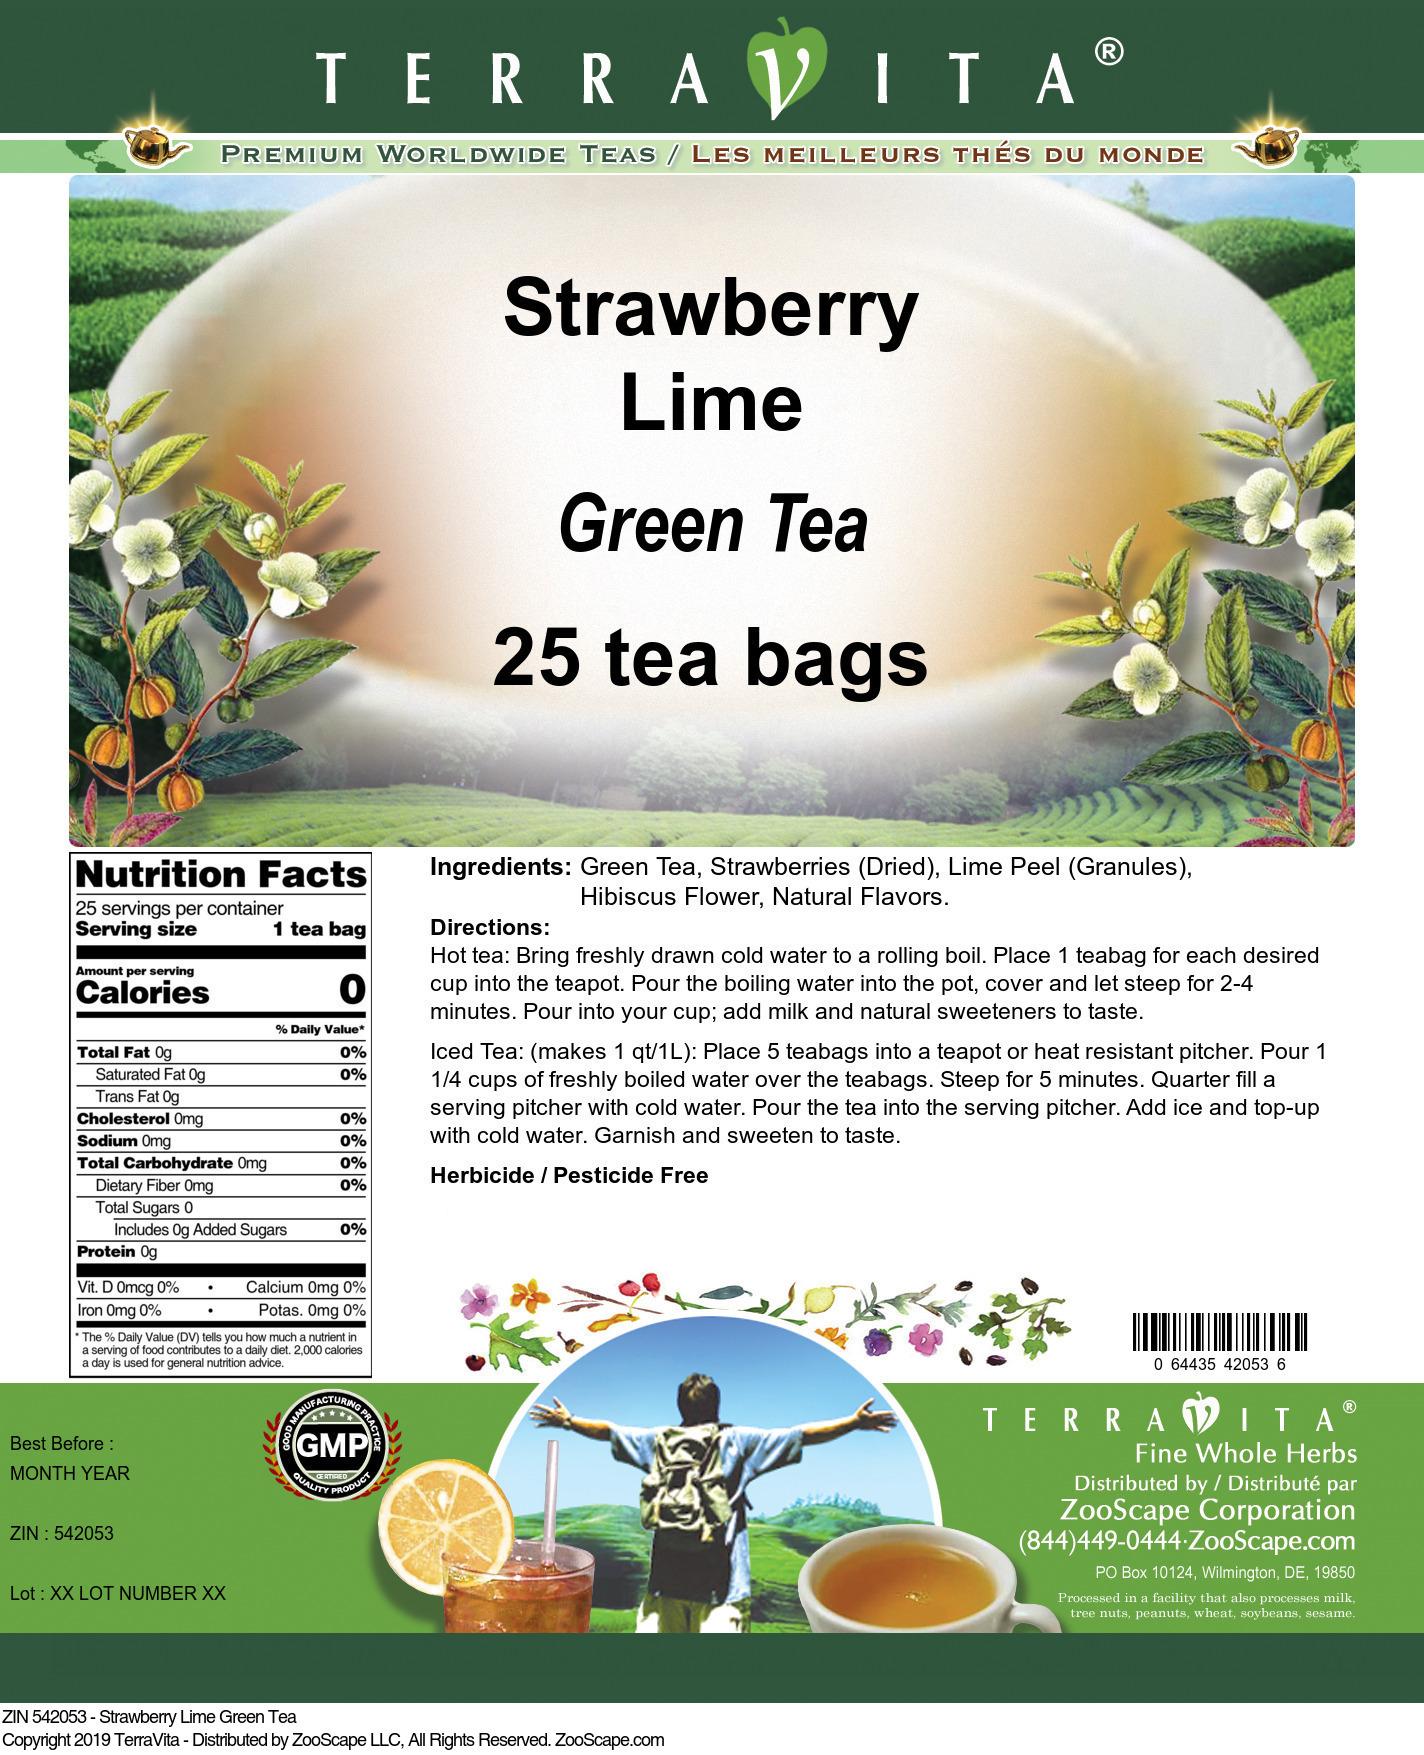 Strawberry Lime Green Tea